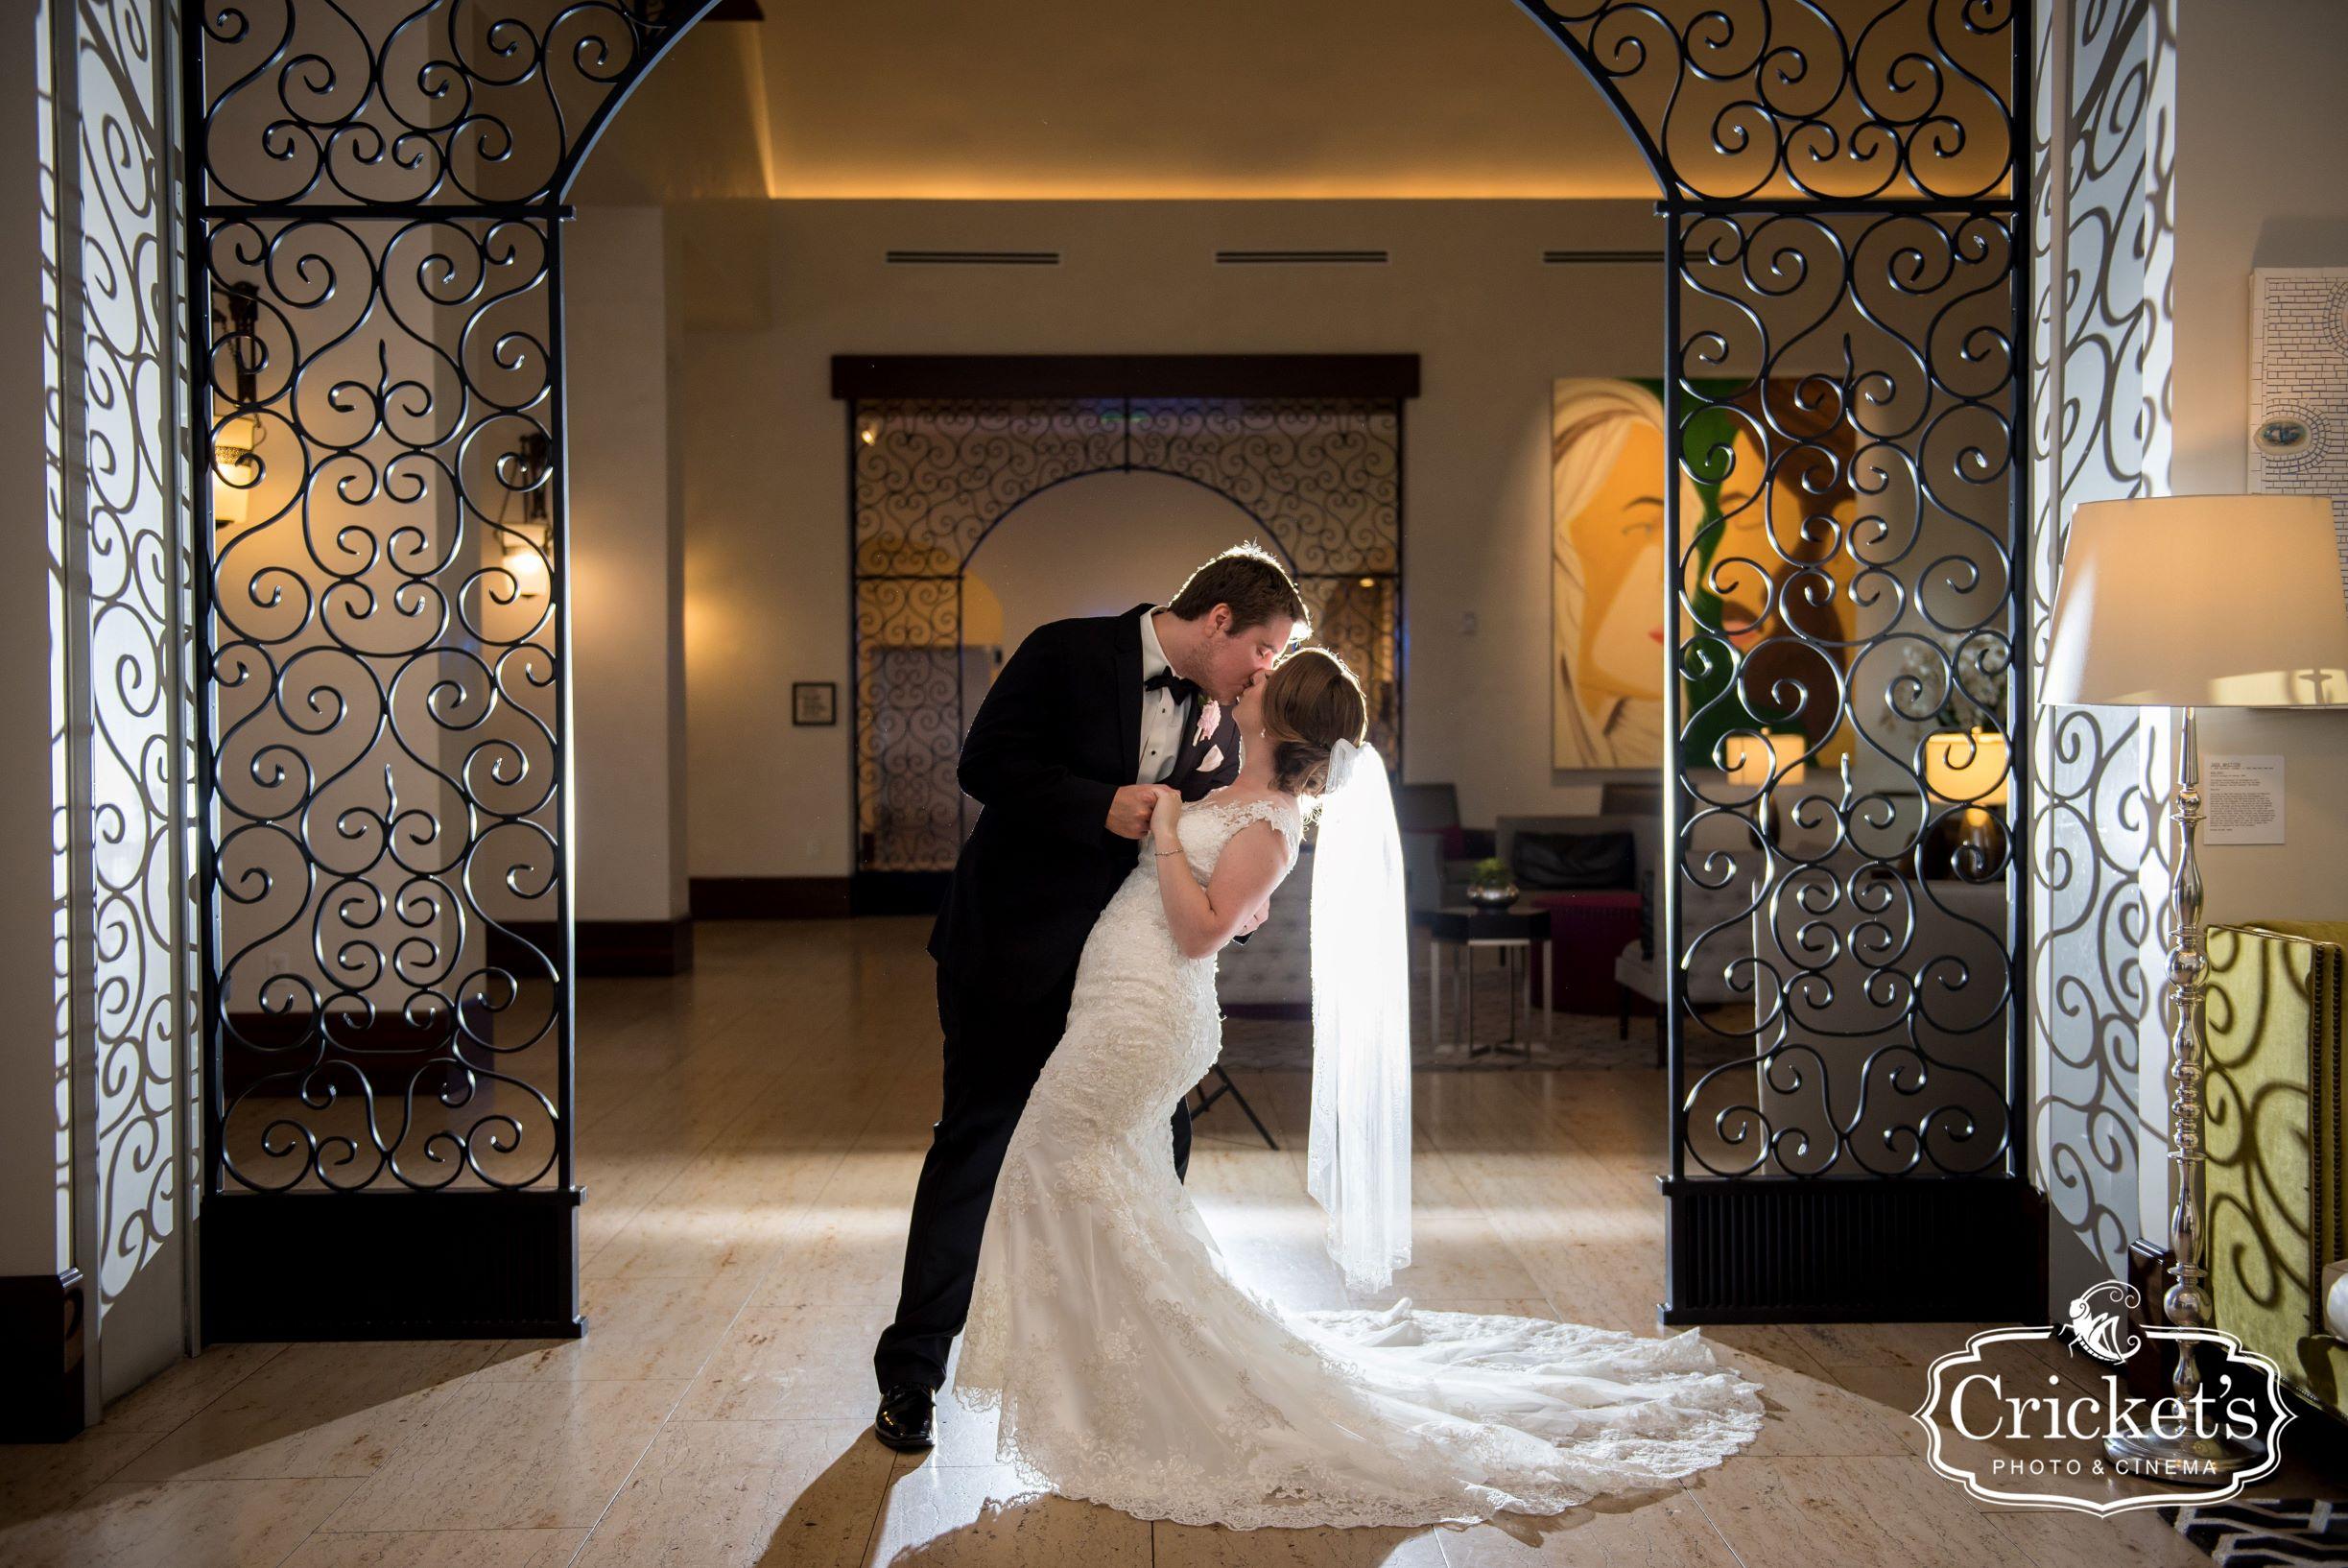 Alfond Inn Wedding | The Real Wedding of Jenn and Kuba